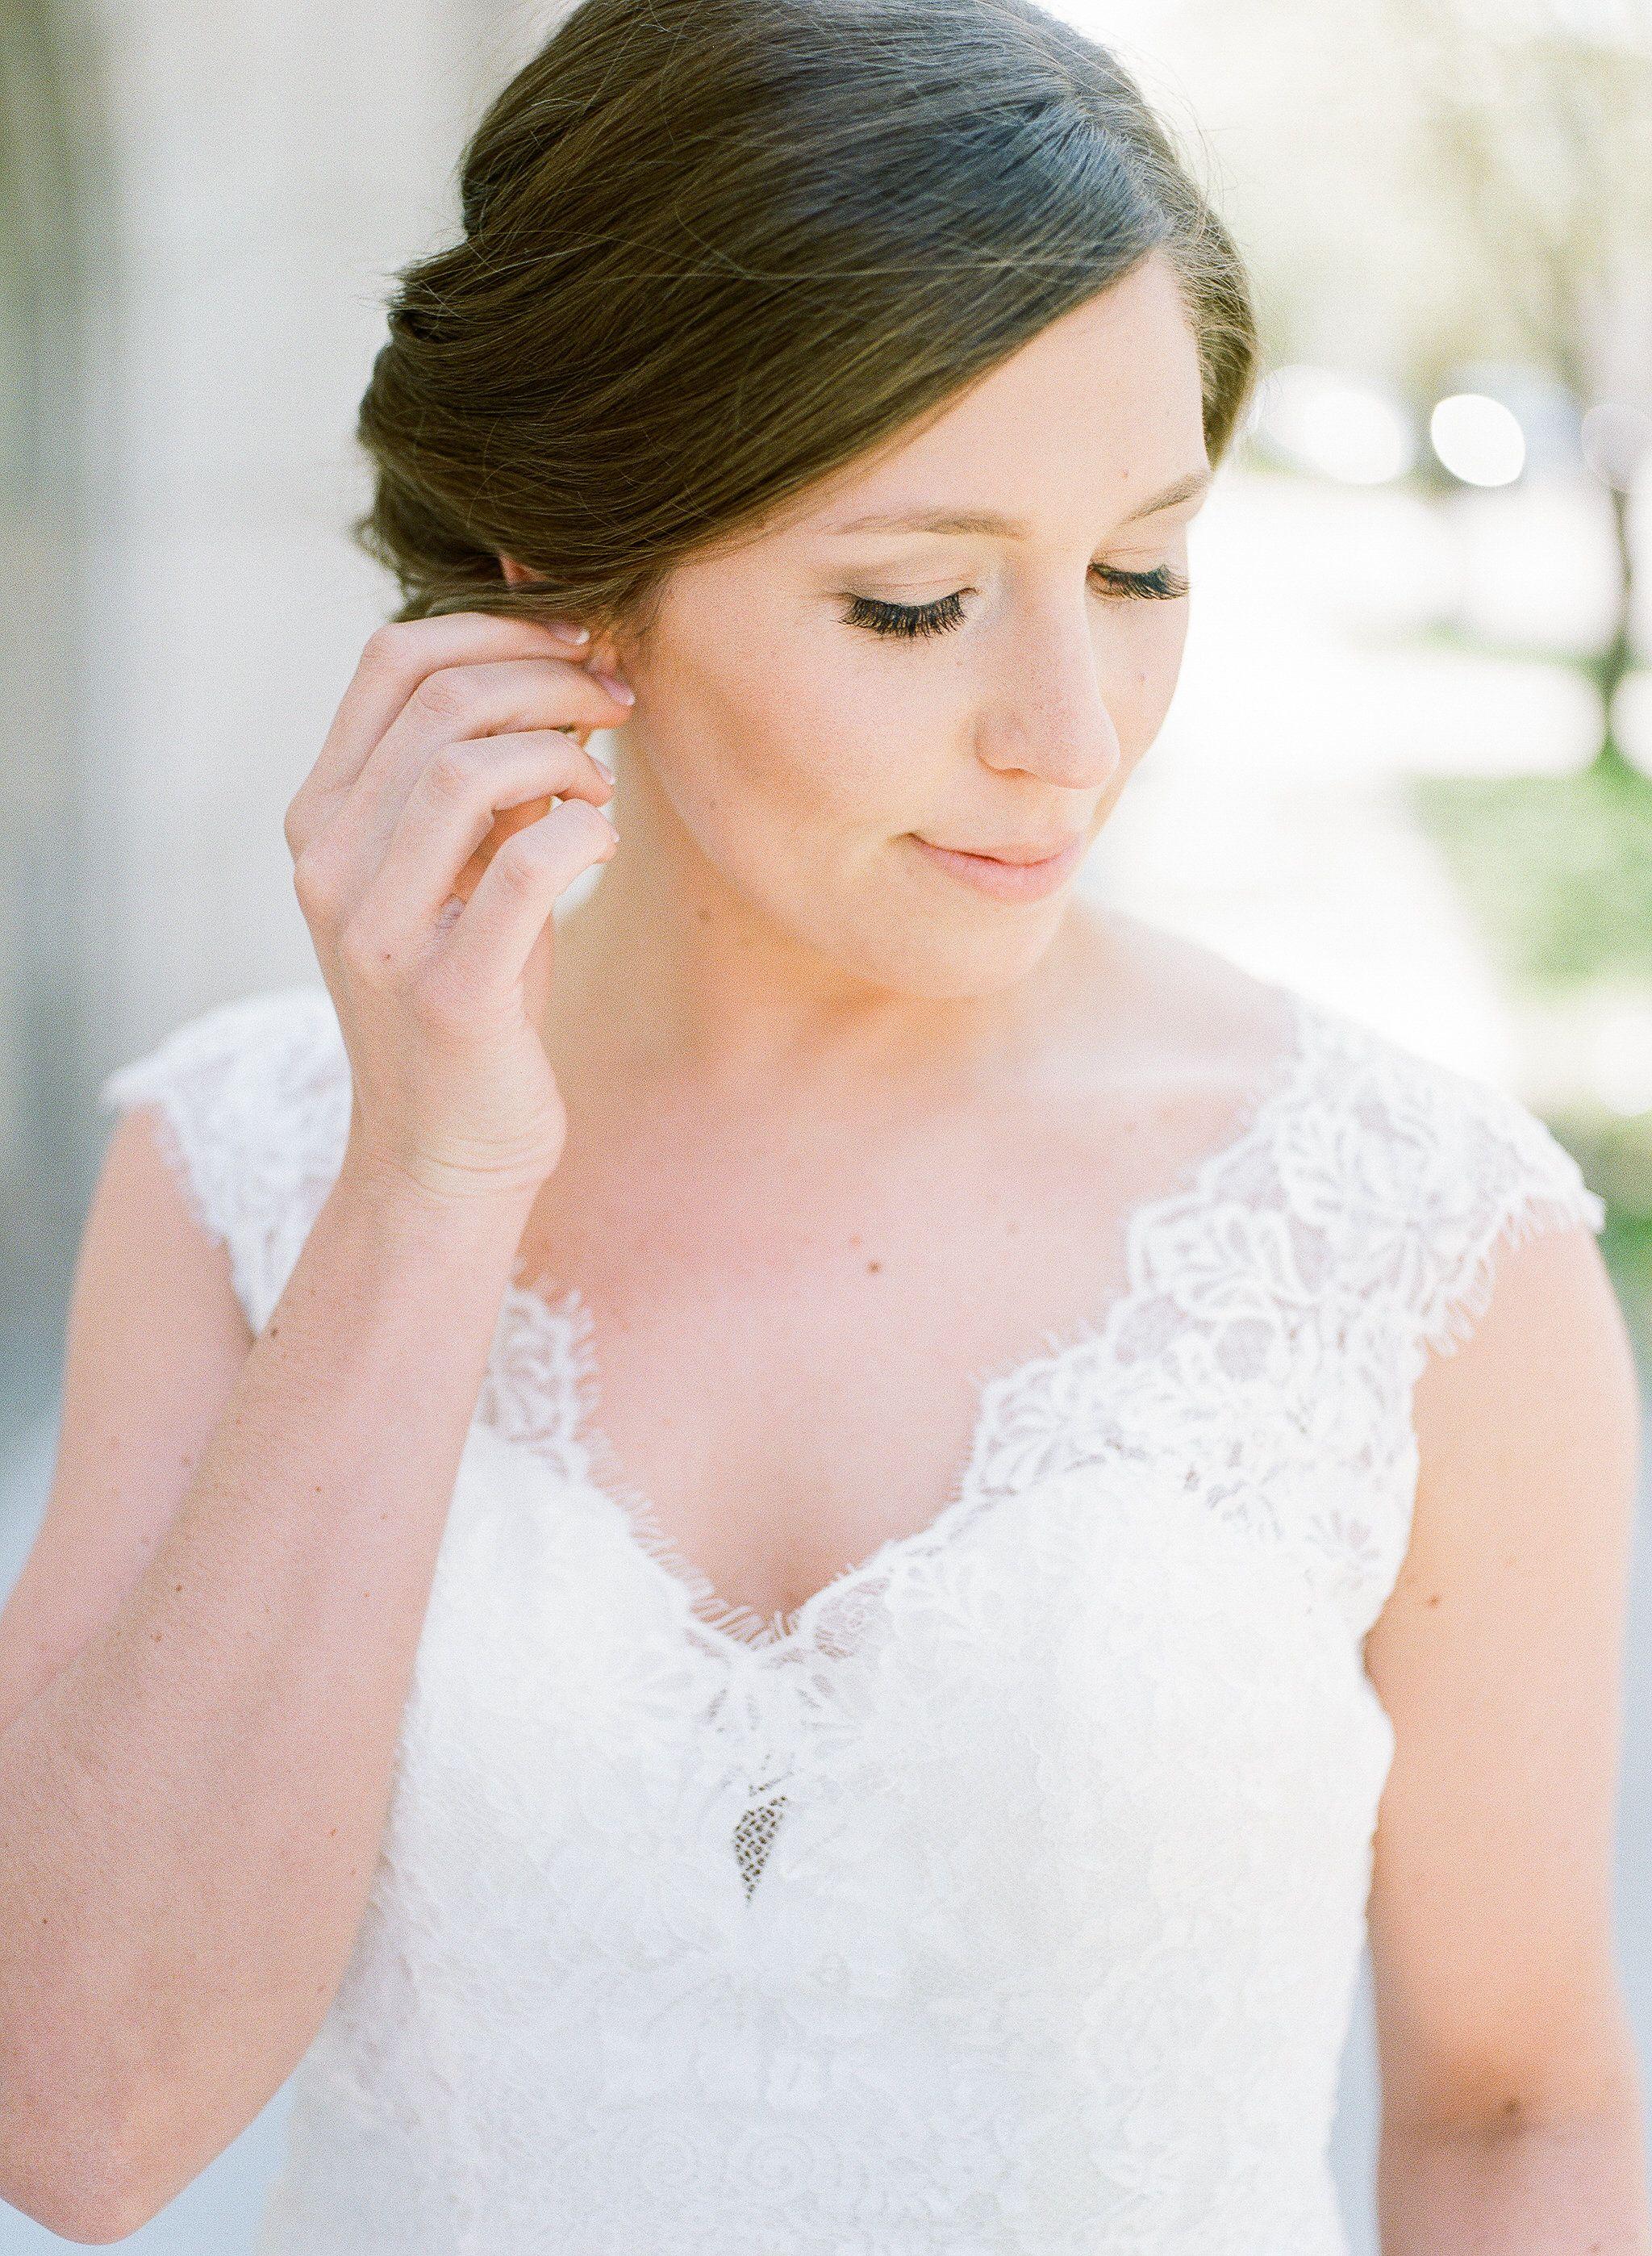 Natural Bridal Makeup in 2020 Bridal beauty makeup